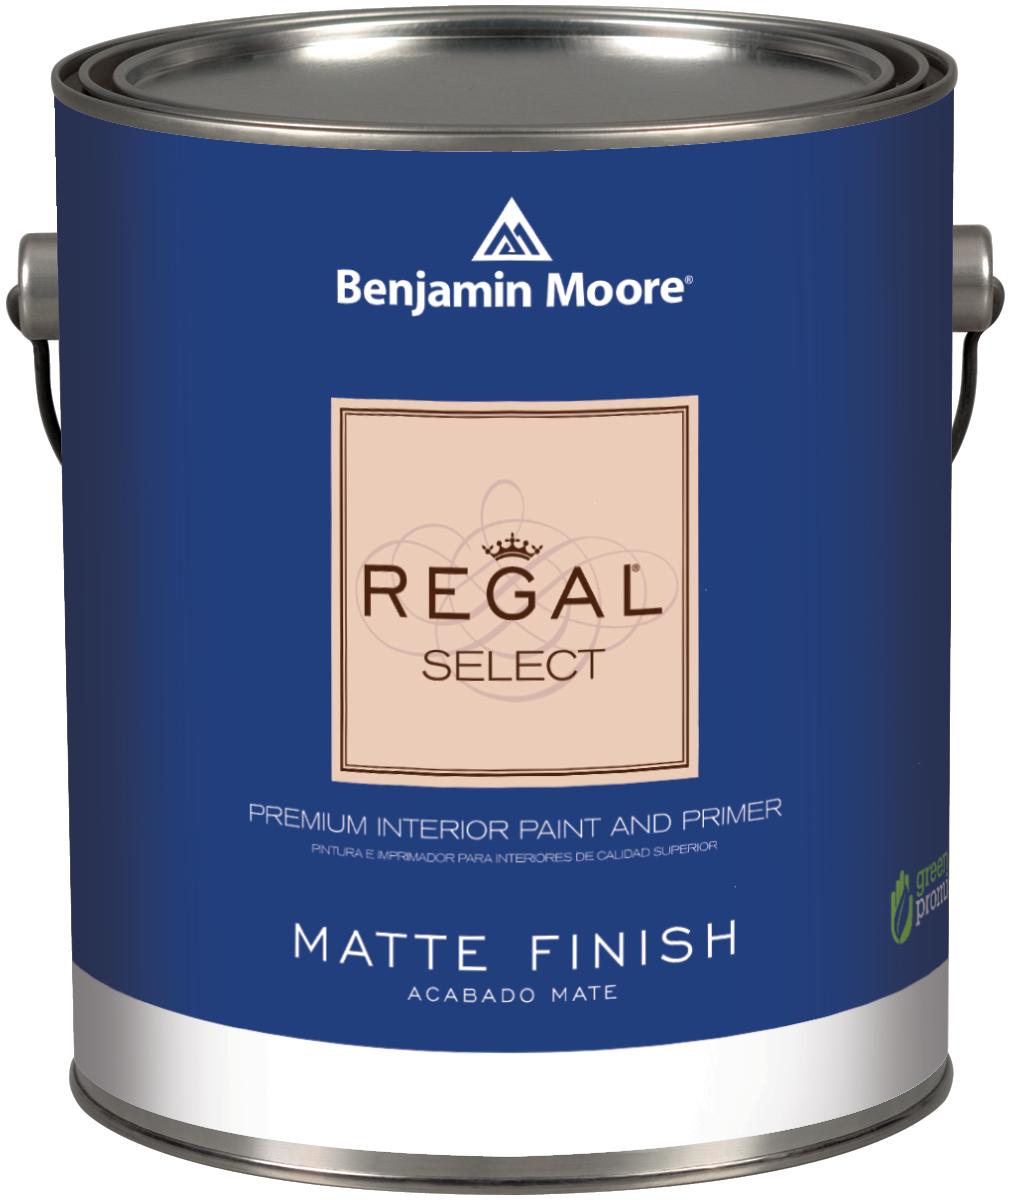 benjamin moore regal select matte paint grosse ile hardware store. Black Bedroom Furniture Sets. Home Design Ideas